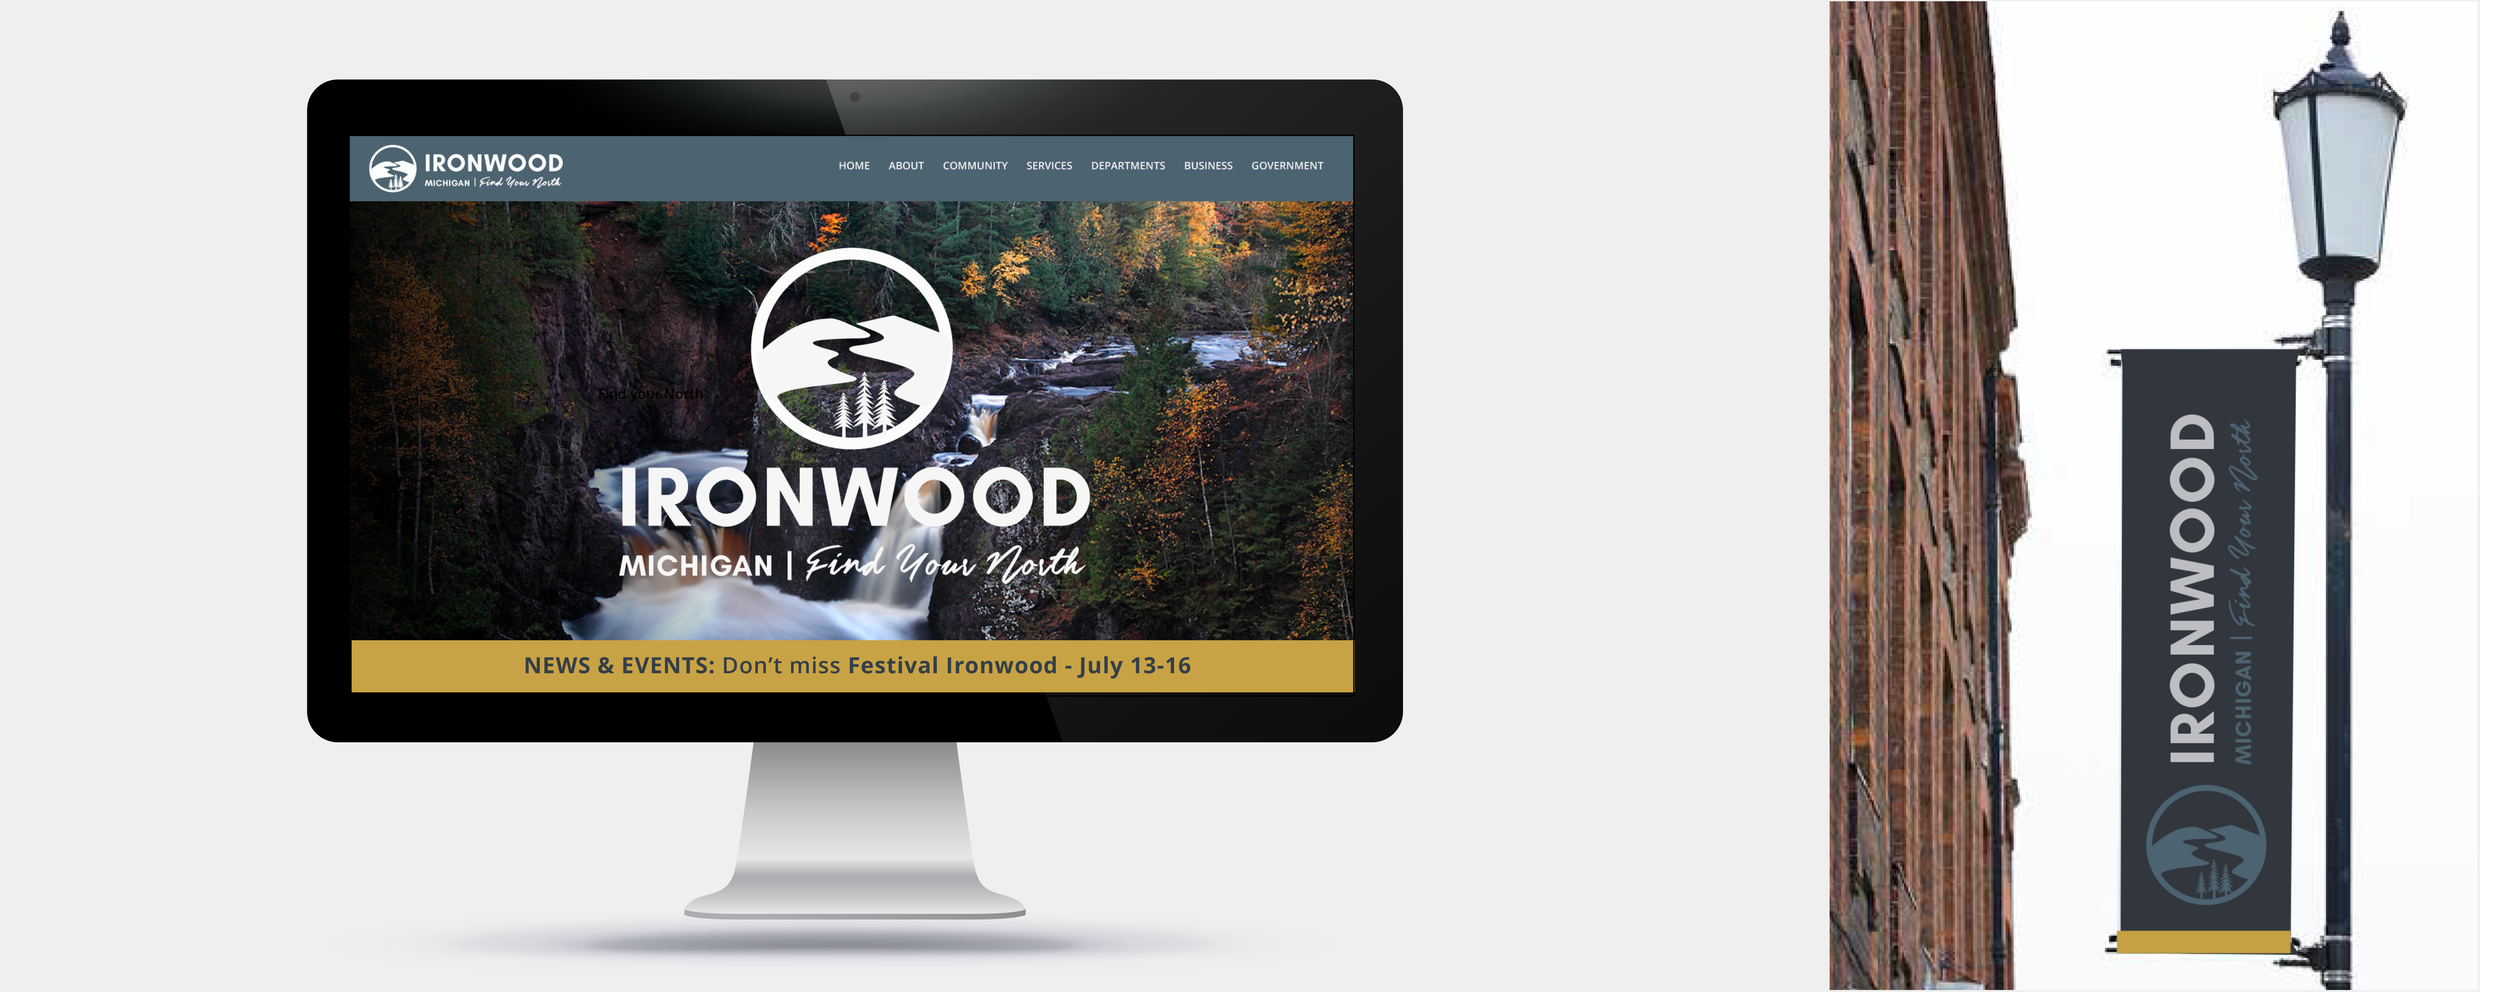 "alt=""Ironwood Michigan papermoon creatives"""